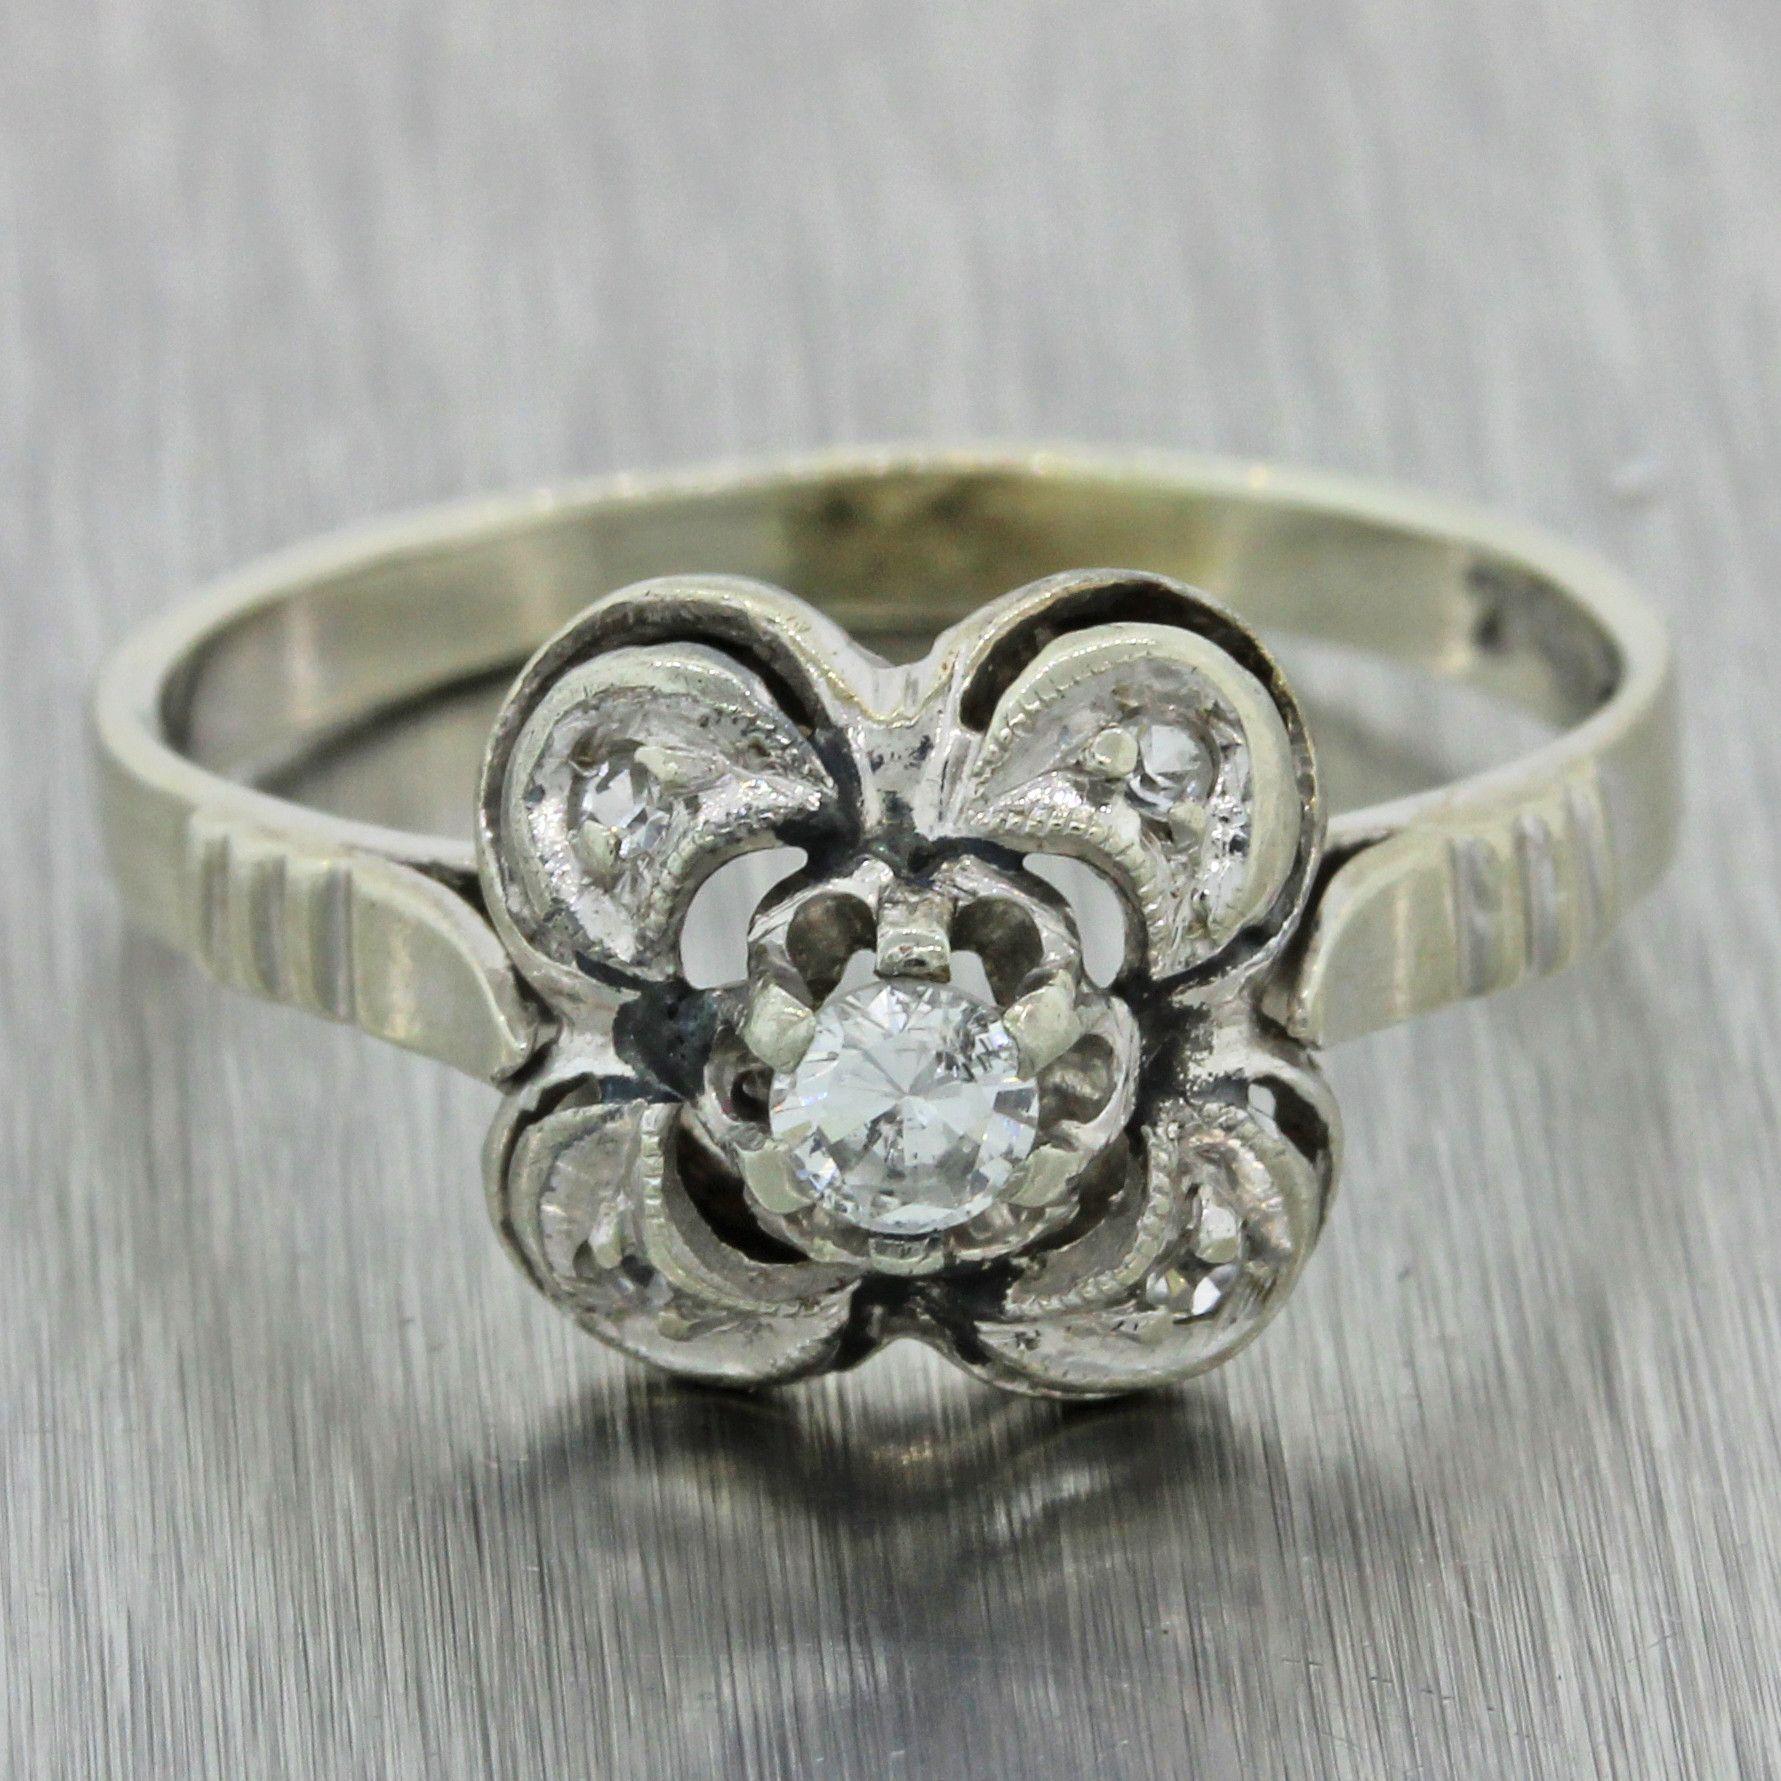 1960s Vintage Estate Art Deco Style 14k Solid White Gold .20ctw Diamond Ring